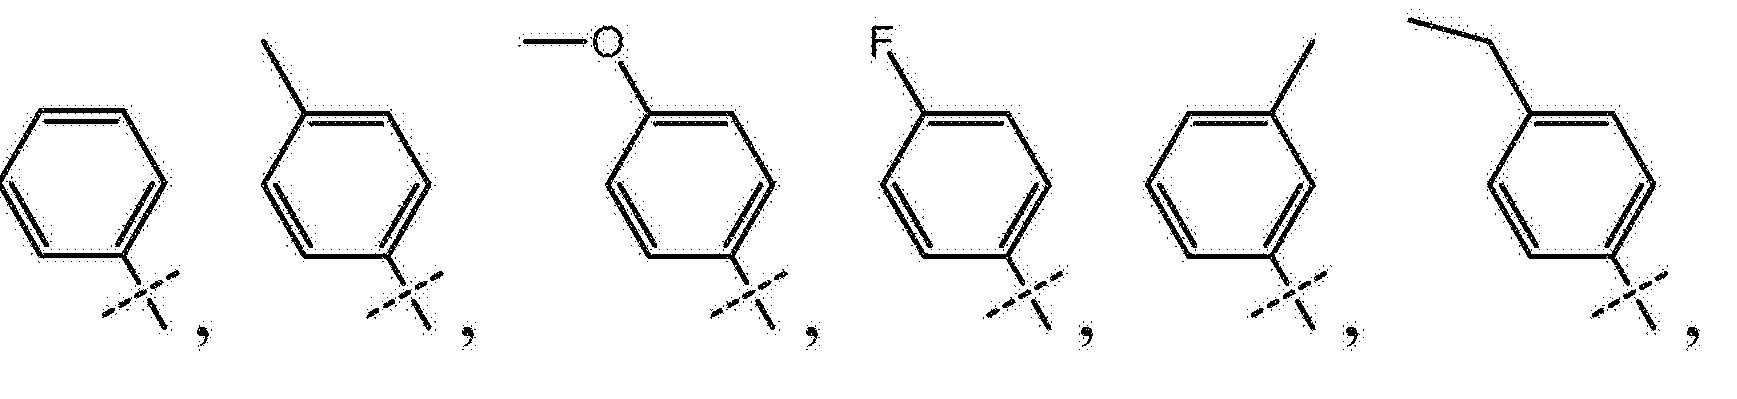 Figure CN105189500AD00161